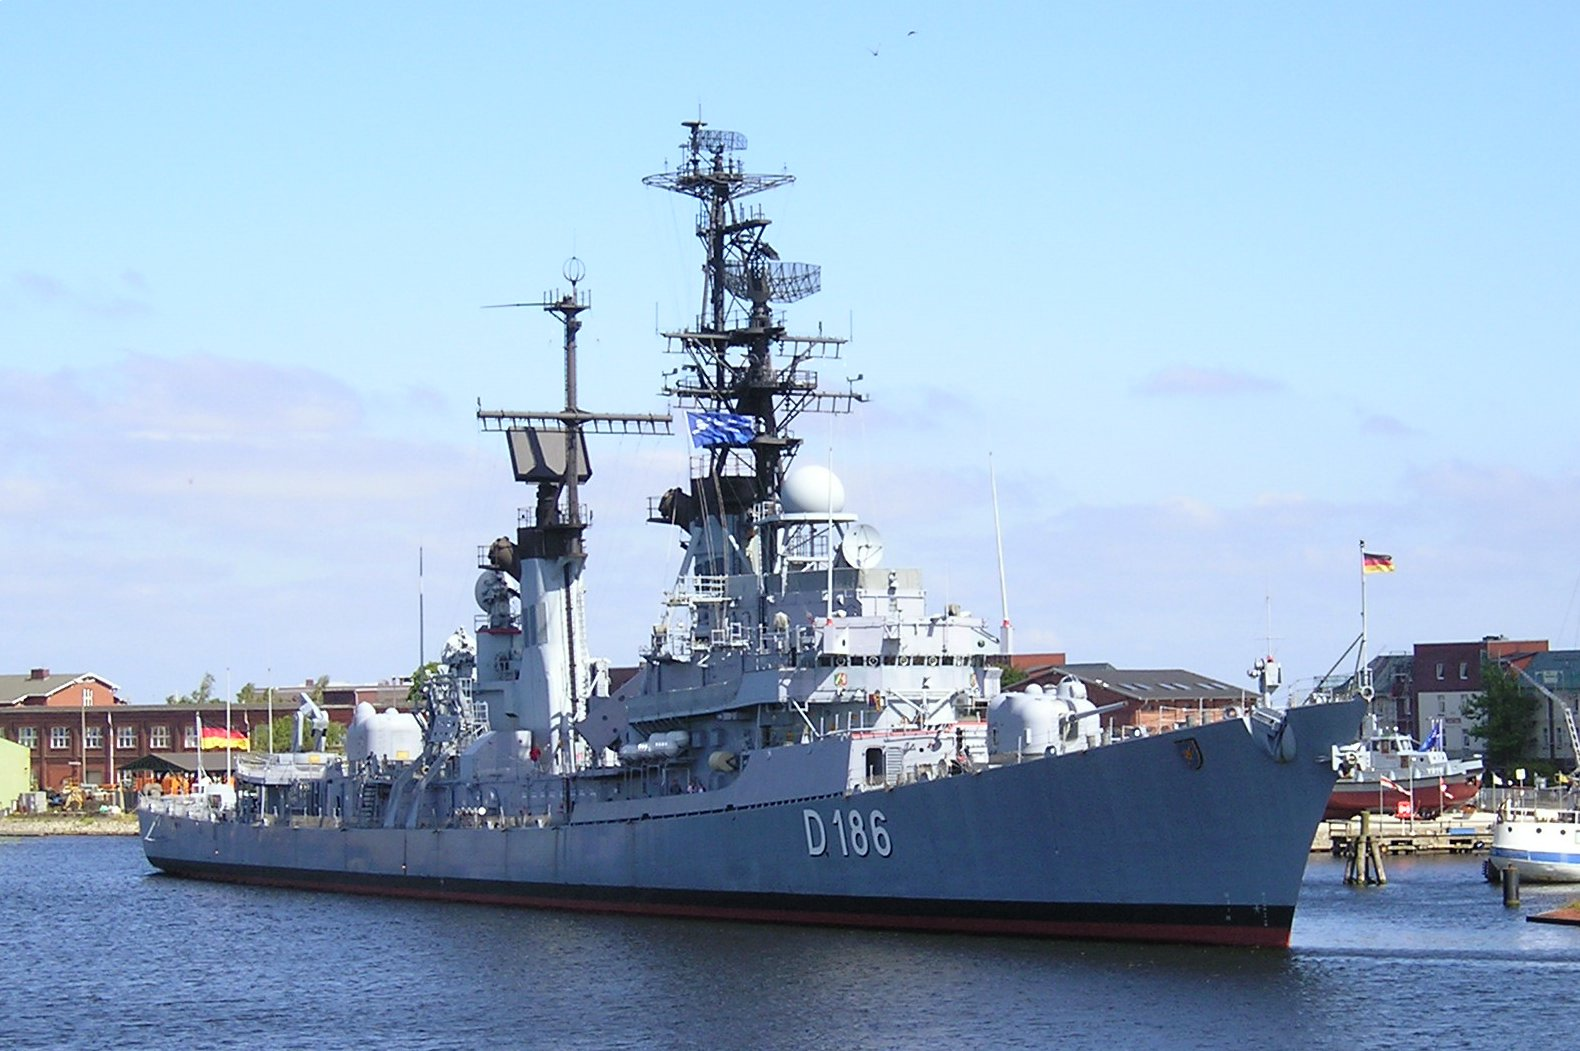 FGS Mölders (D-186)